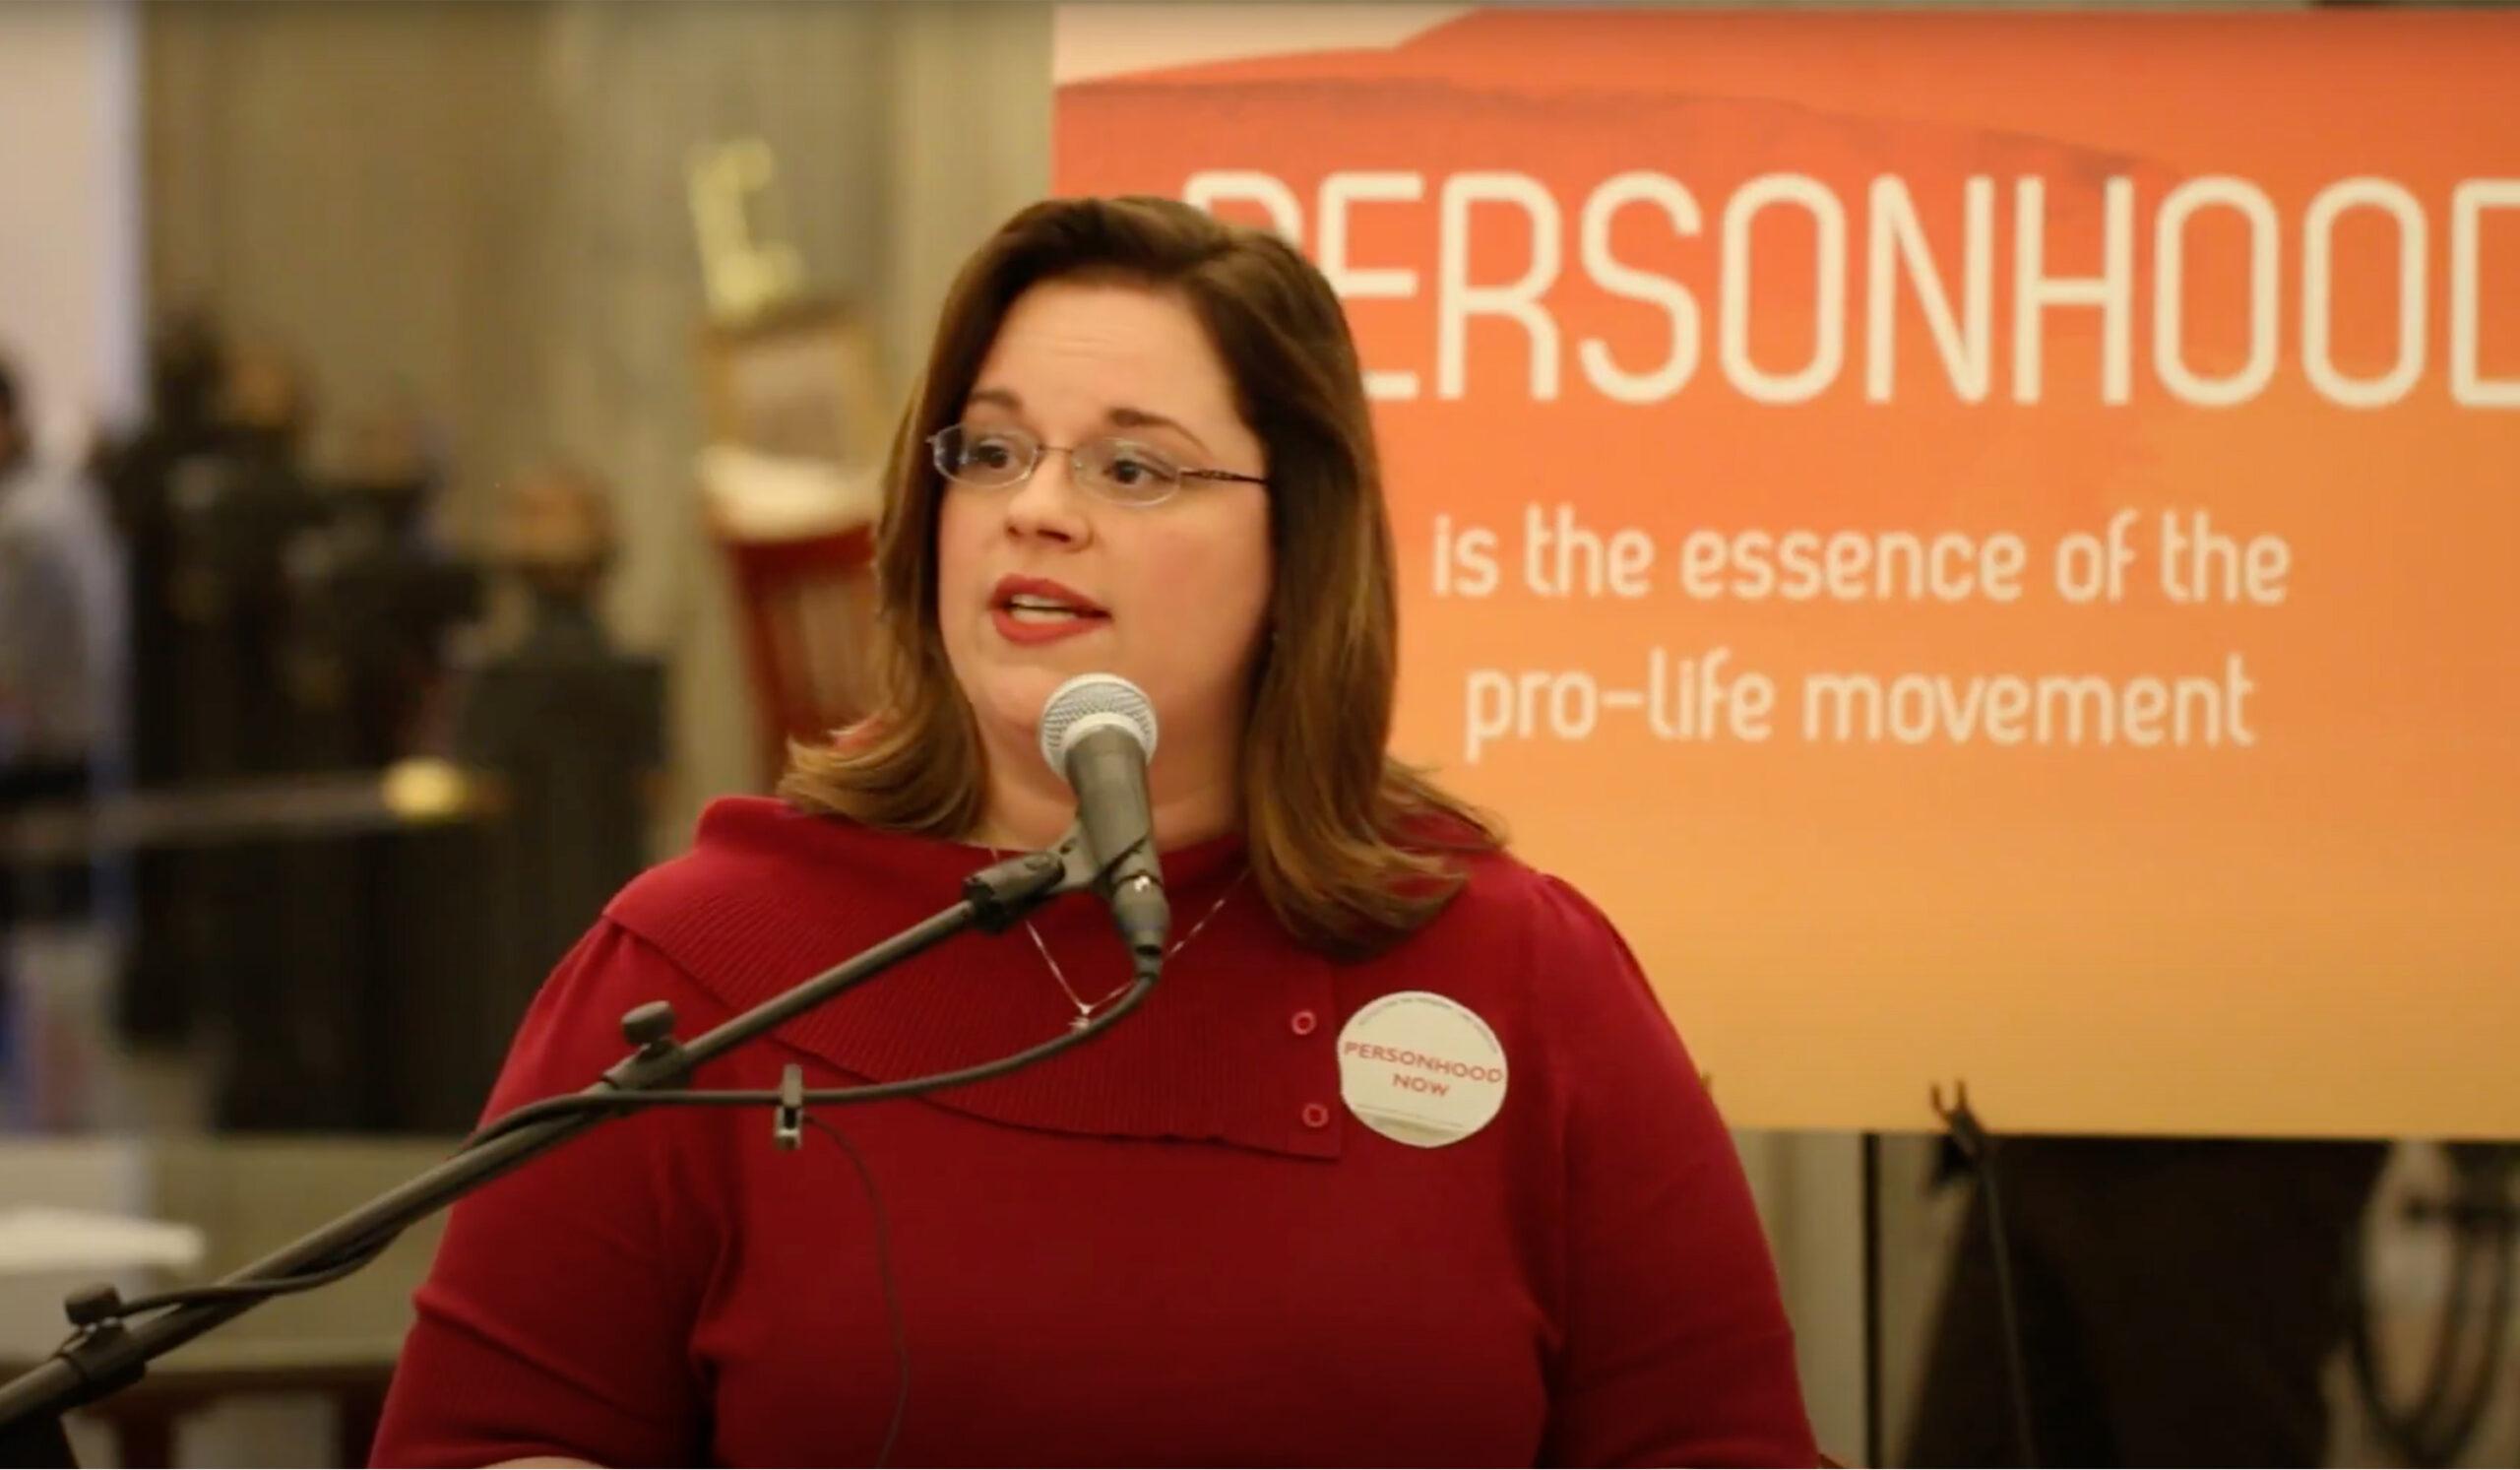 Personhood South Carolina Spokeswoman Ashley Lawton